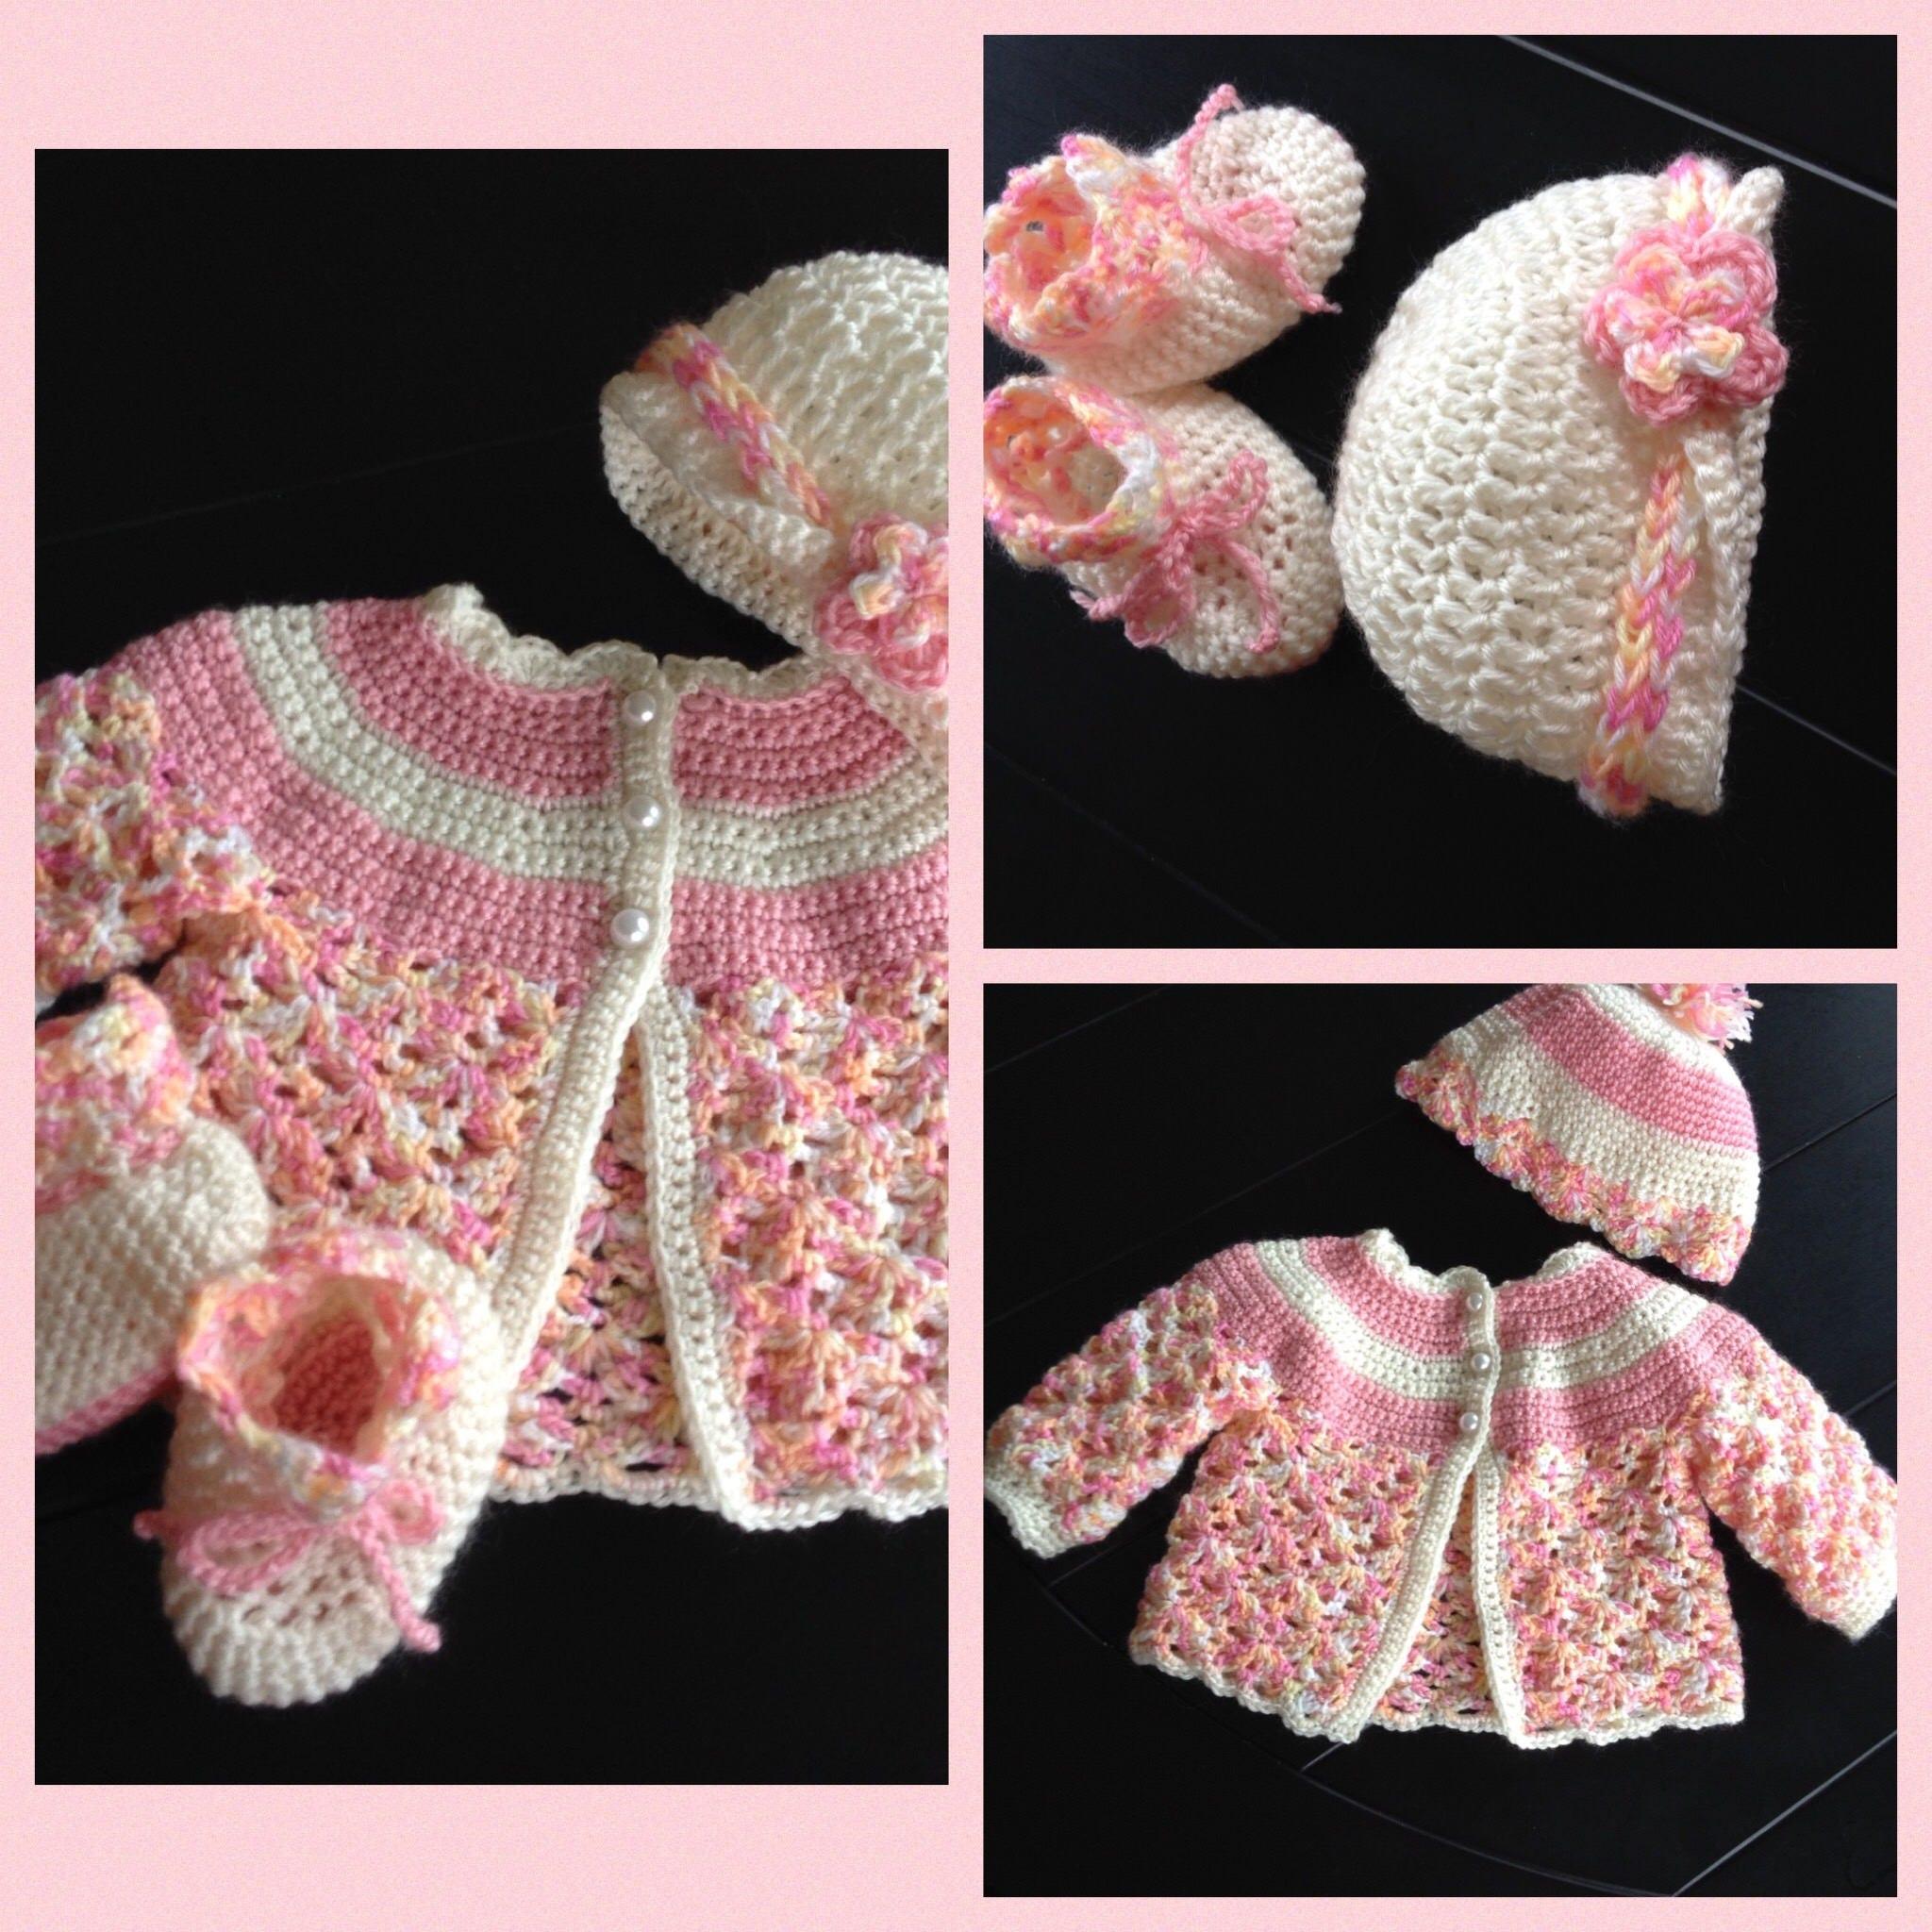 c2b10c41f Pink crochet baby layette cardigan sweater set Baby shower Newborn ...